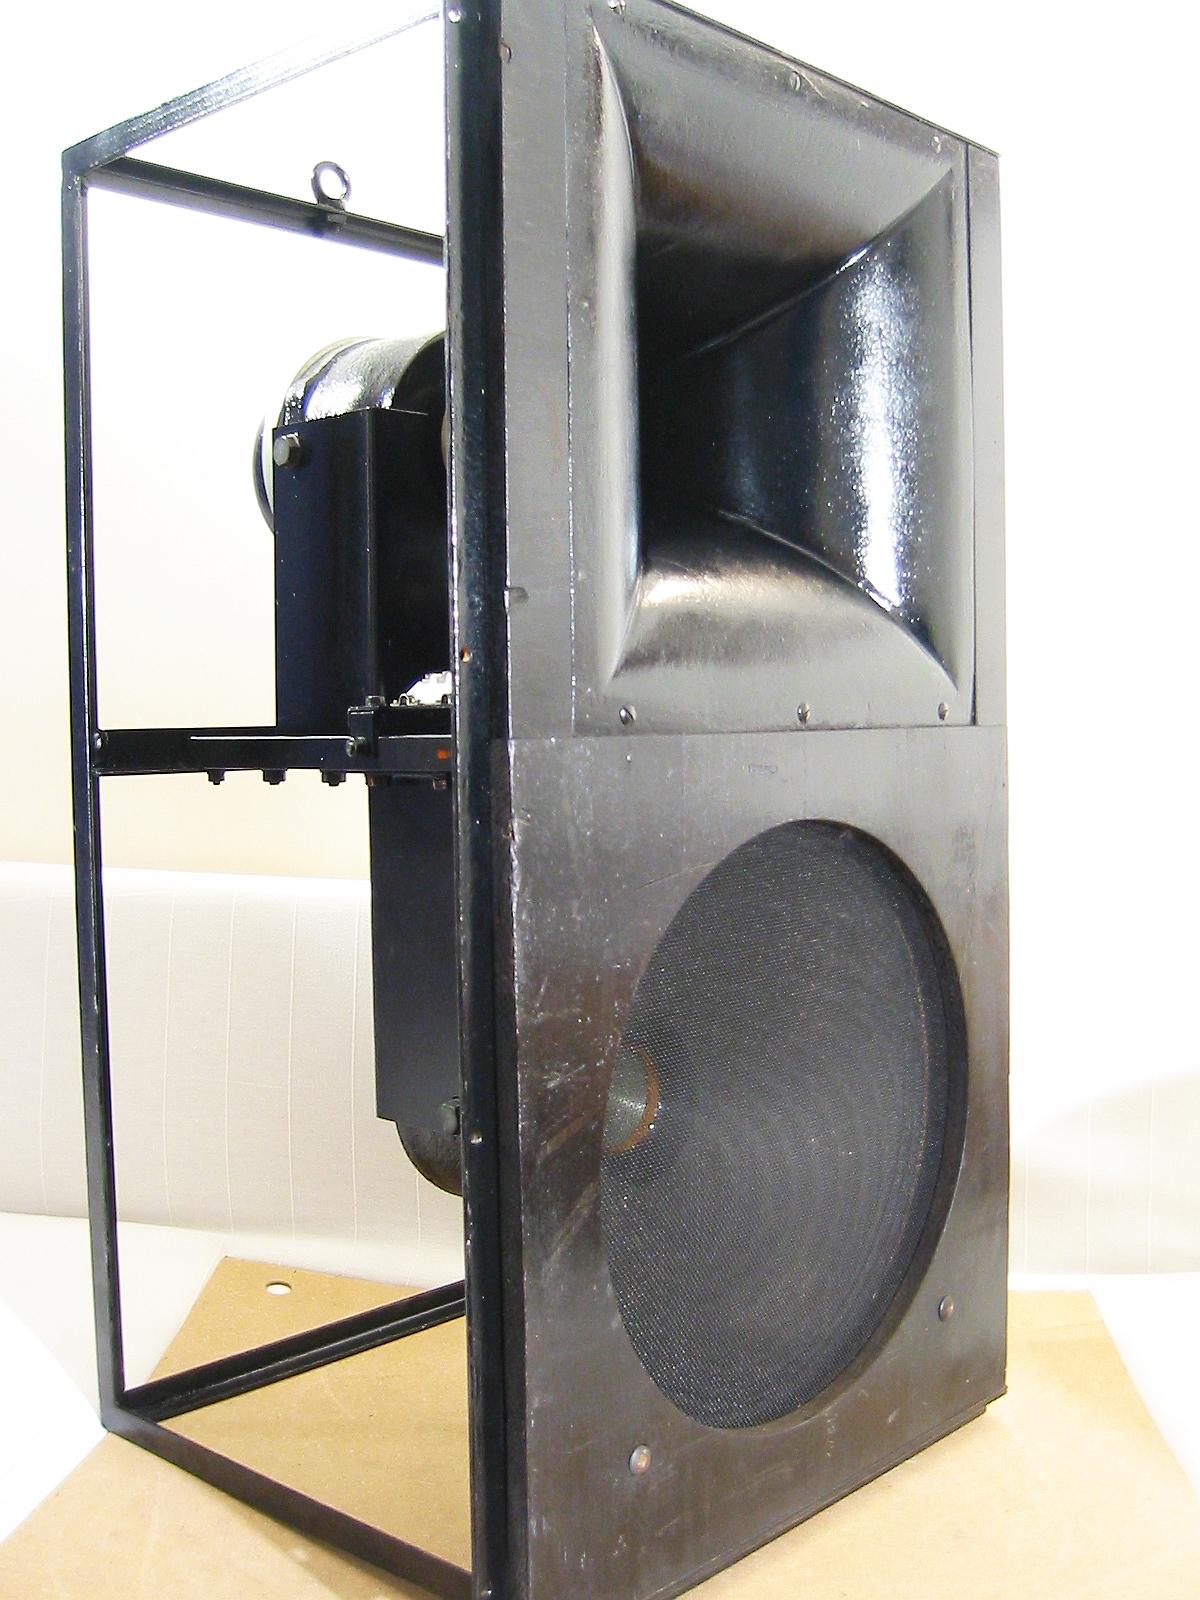 Open Baffle with Horn, PureAudioProject way - diyAudio